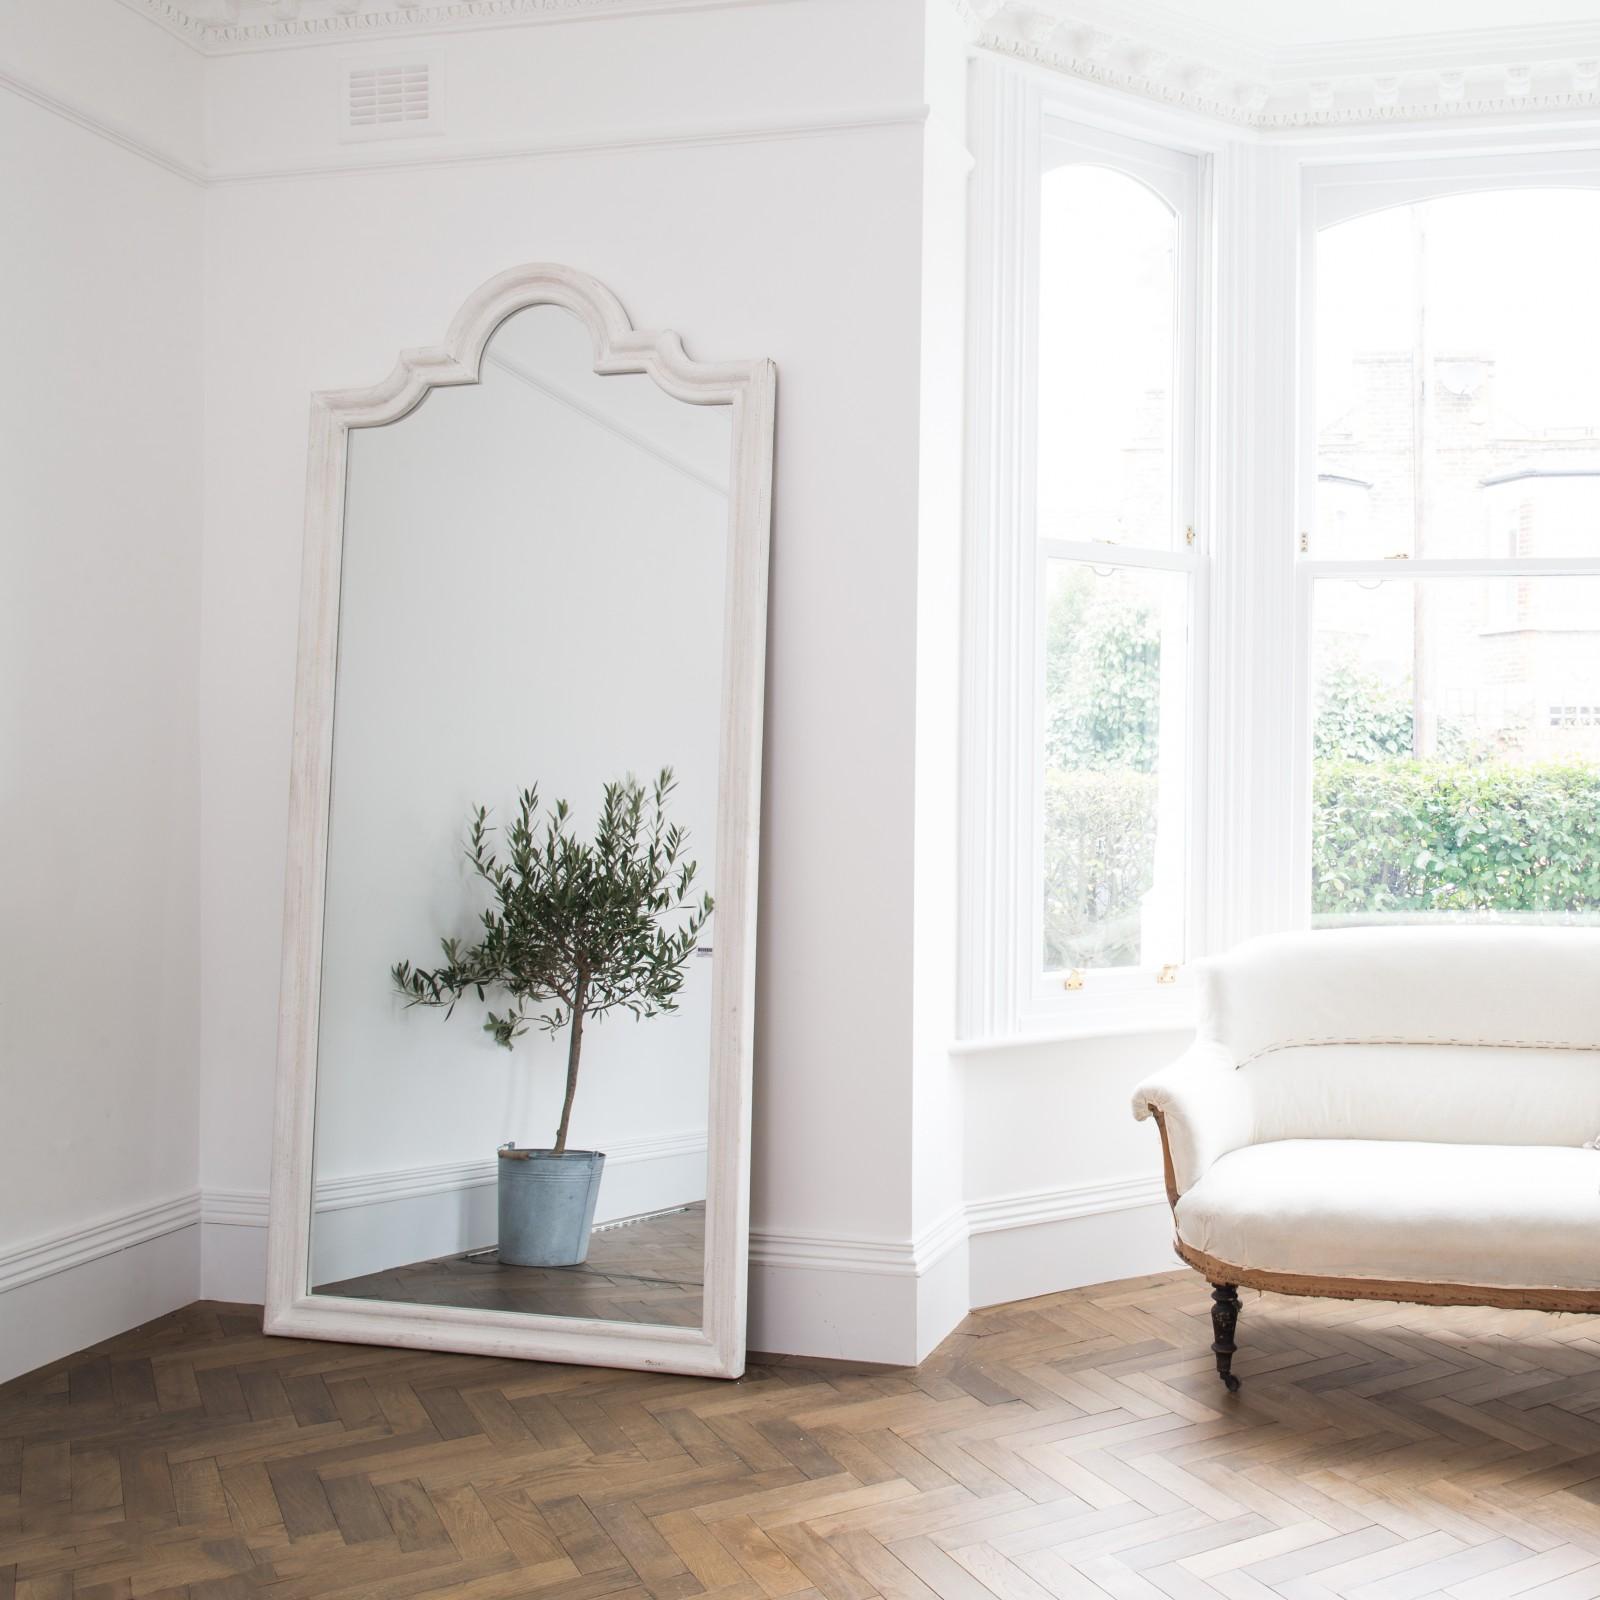 Off White Large Mirror Furniture La Maison Chic Luxury